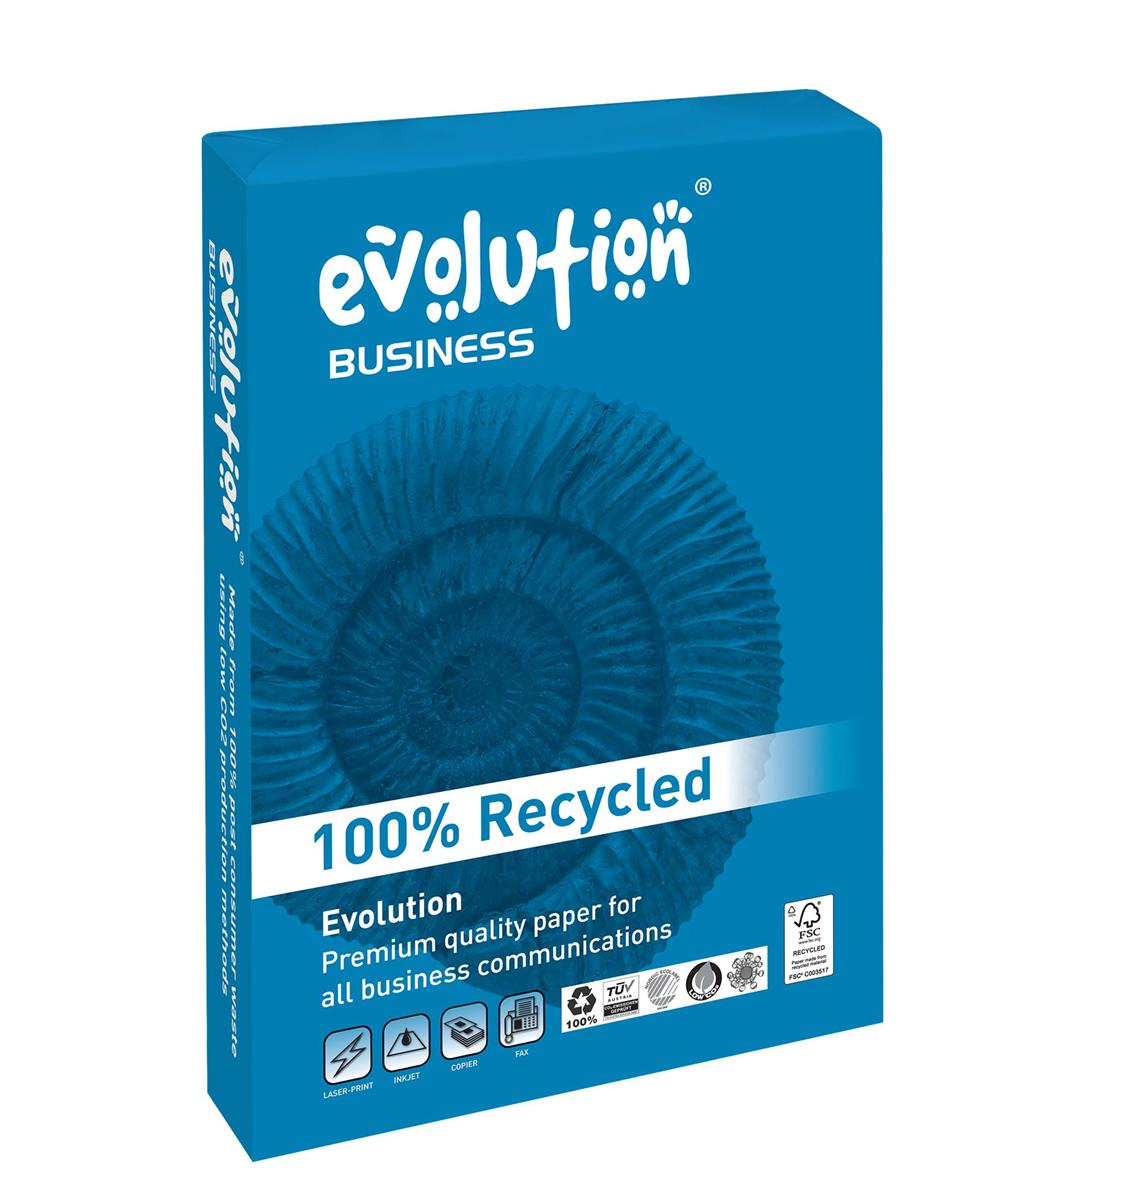 Evolution Business Recycled Paper 100gsm FSC A4 Ref EVBU21100